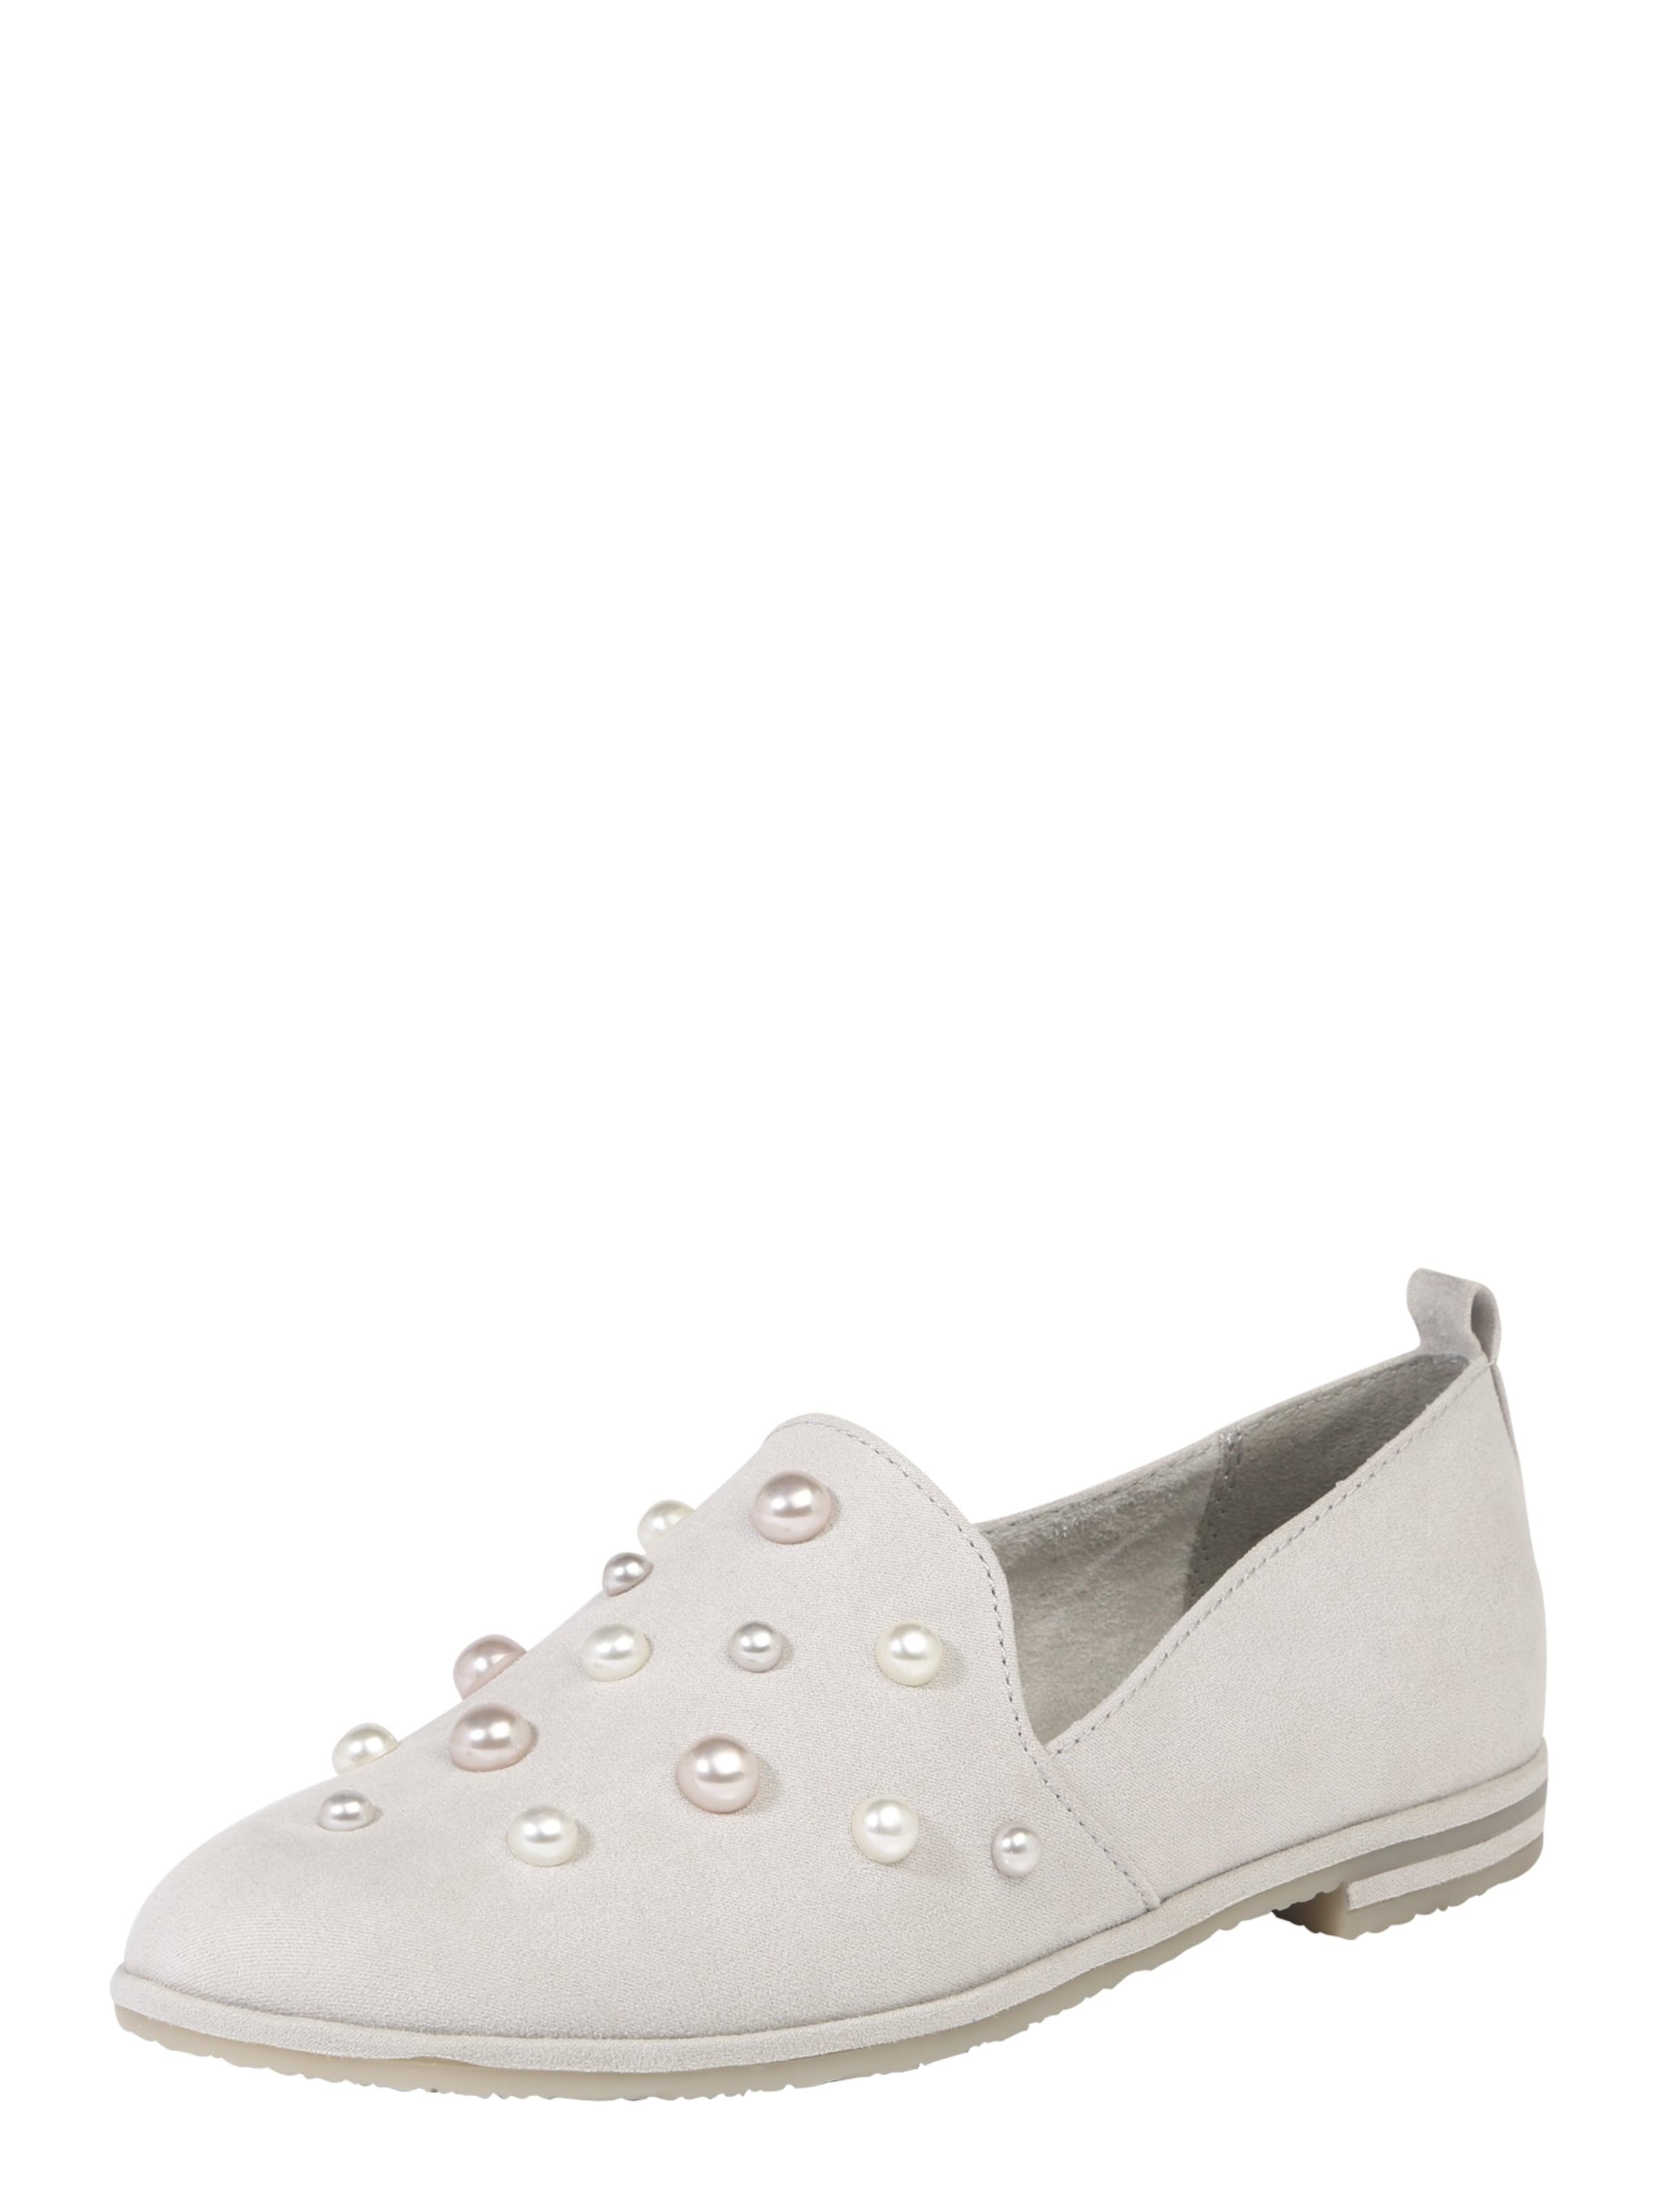 Haltbare Mode billige Schuhe MARCO TOZZI | Ballerina Schuhe Gut getragene Schuhe